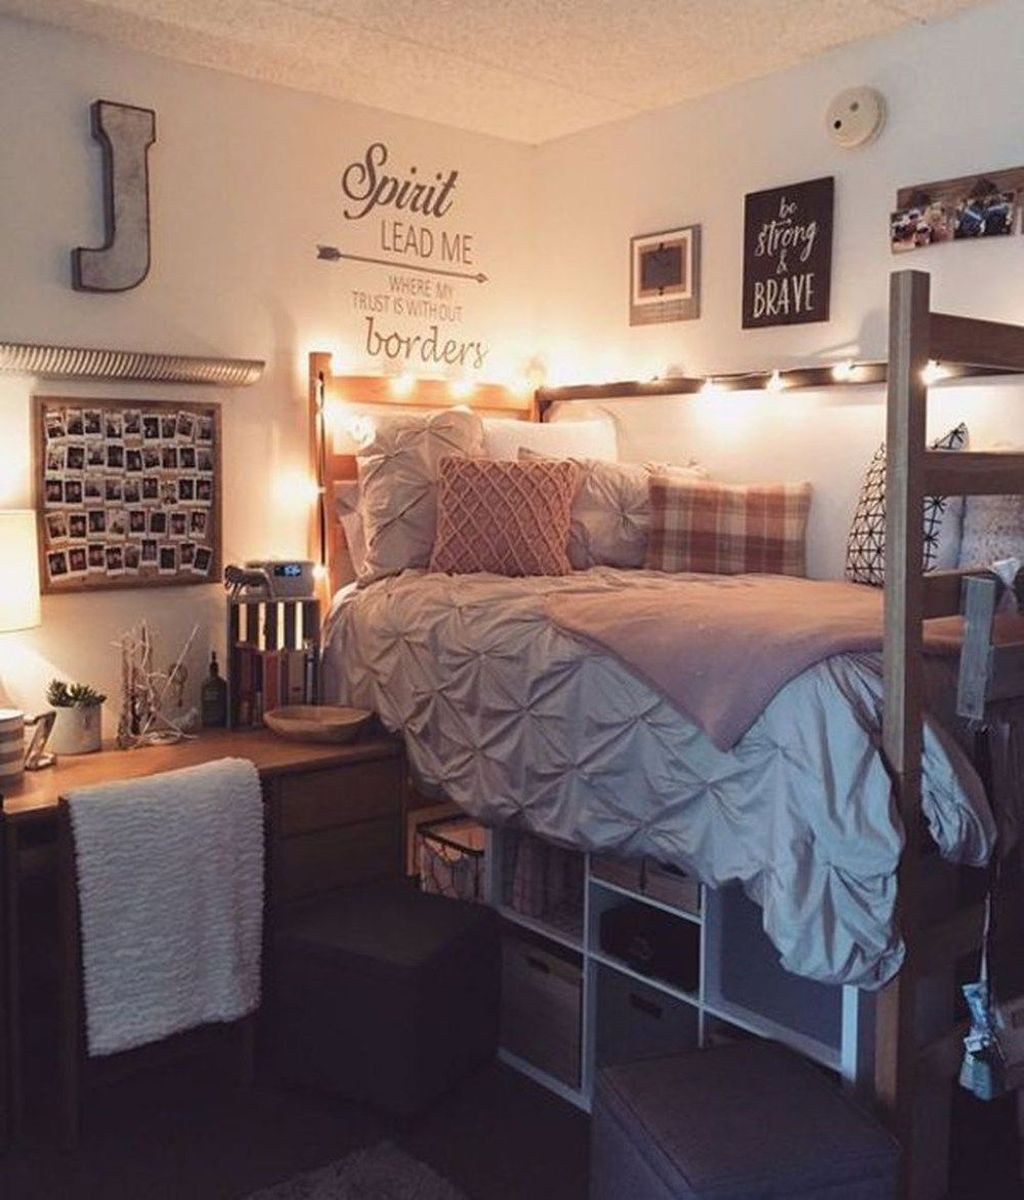 46 Charming Diy Dorm Room Decorating Ideas On A Budget Decoomo